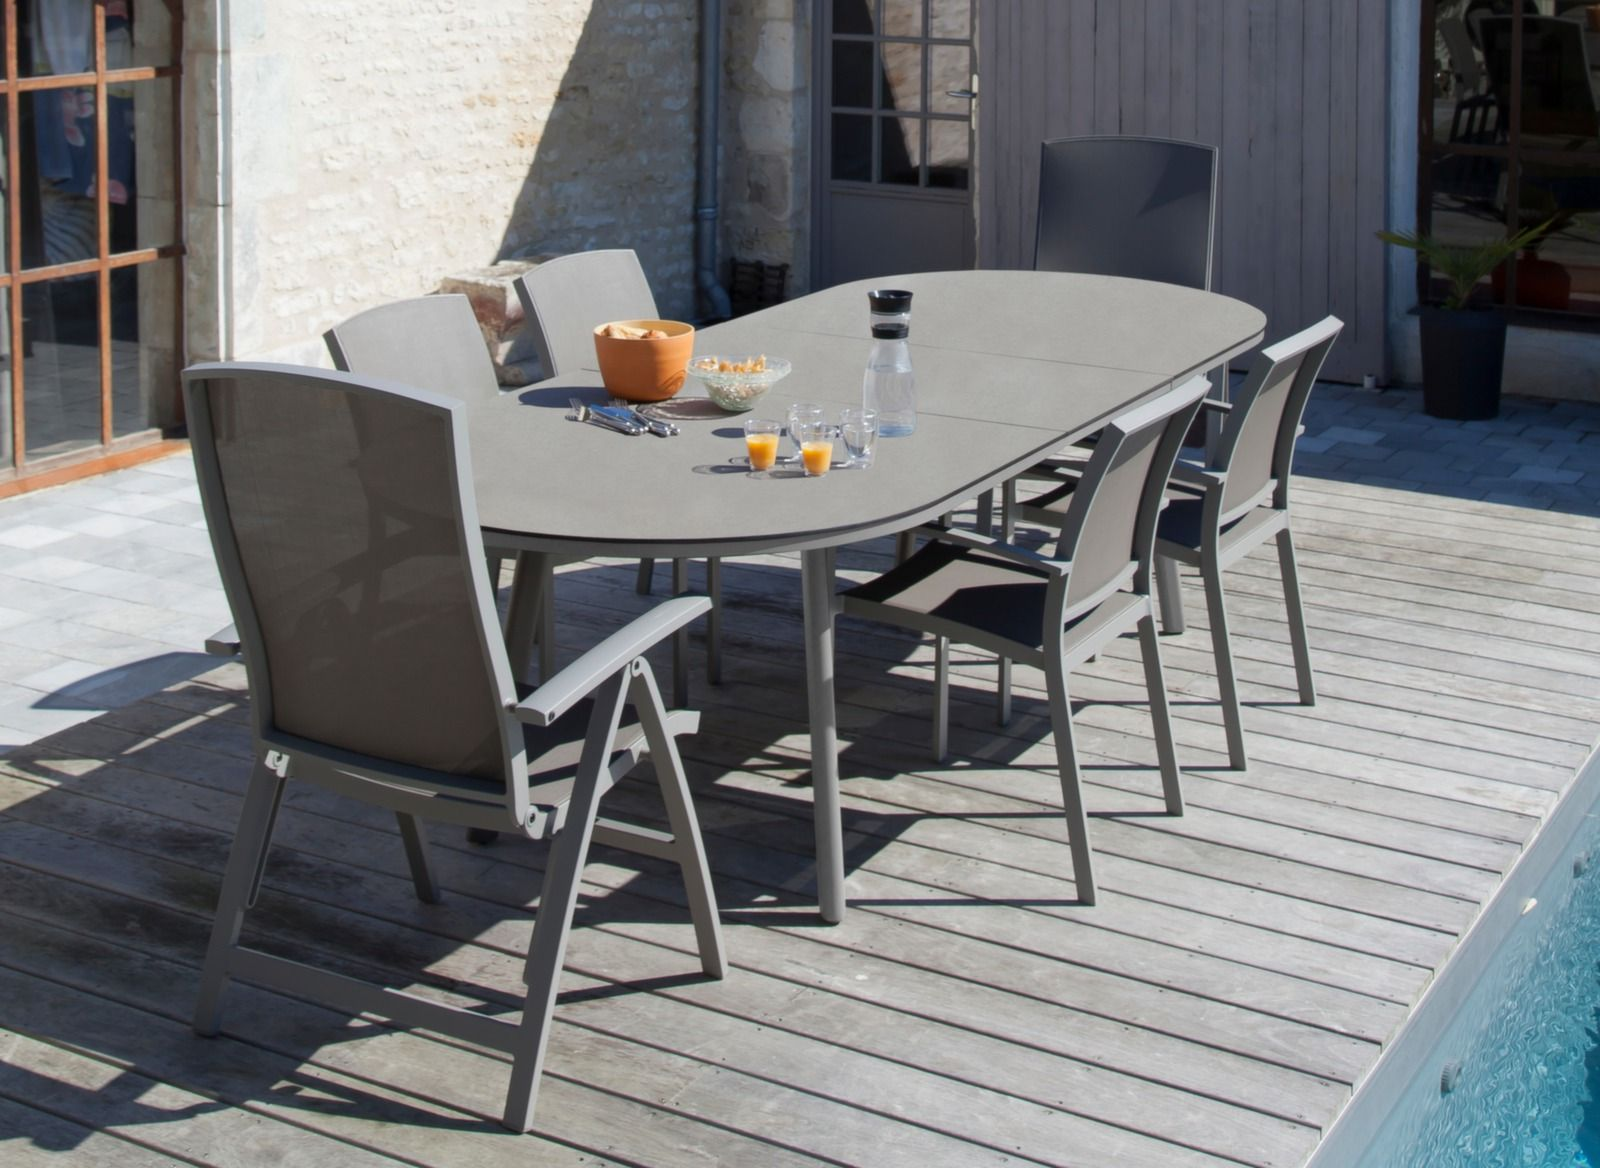 Salon de jardin en résine tressée 8 fauteuils Chocolat